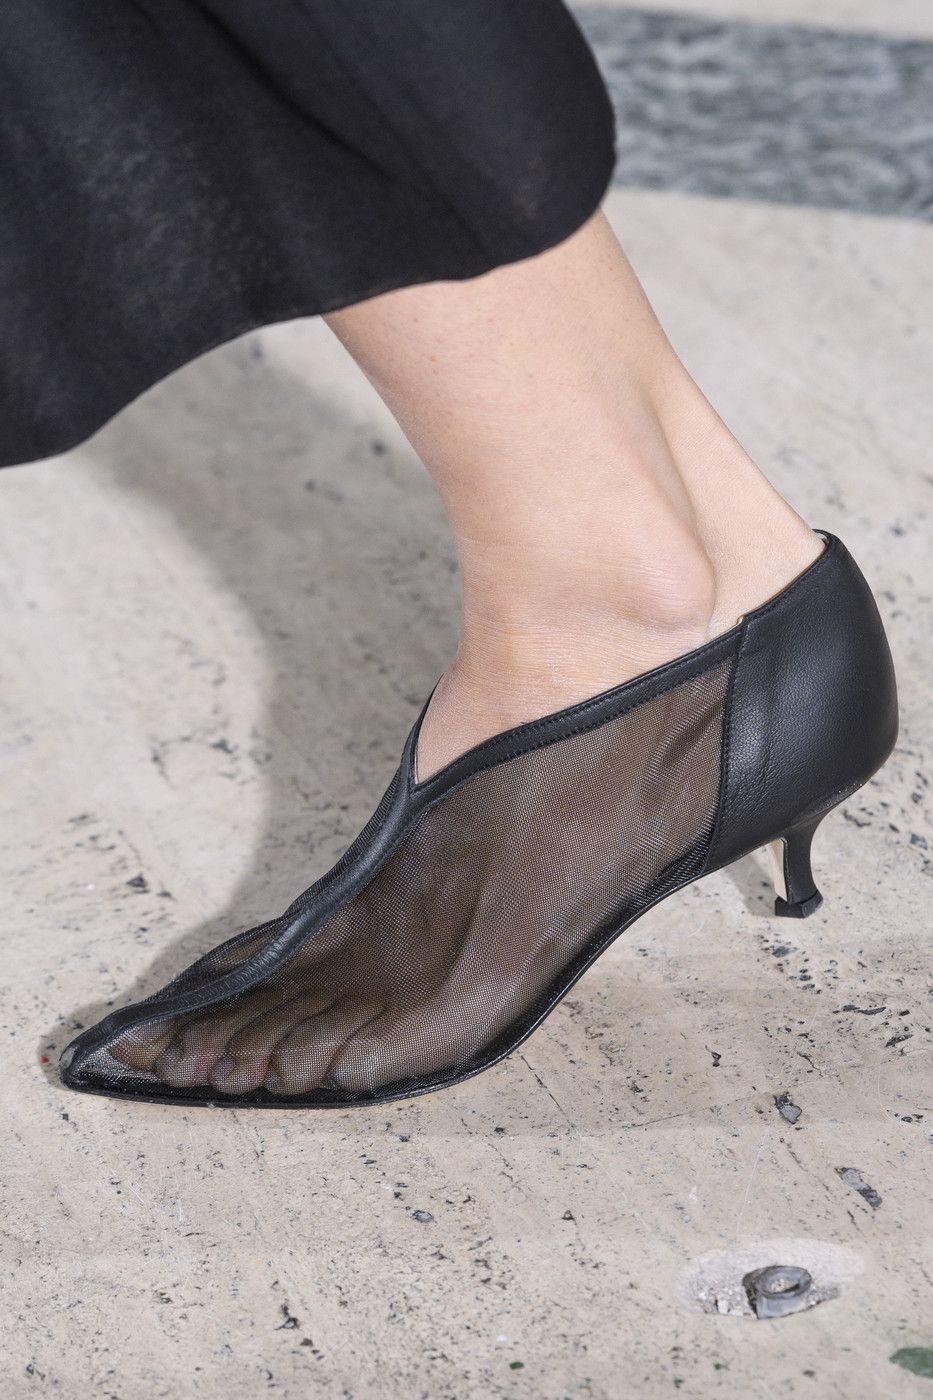 gabriela peregrina_strutting my style_tibi_sheer black.jpg